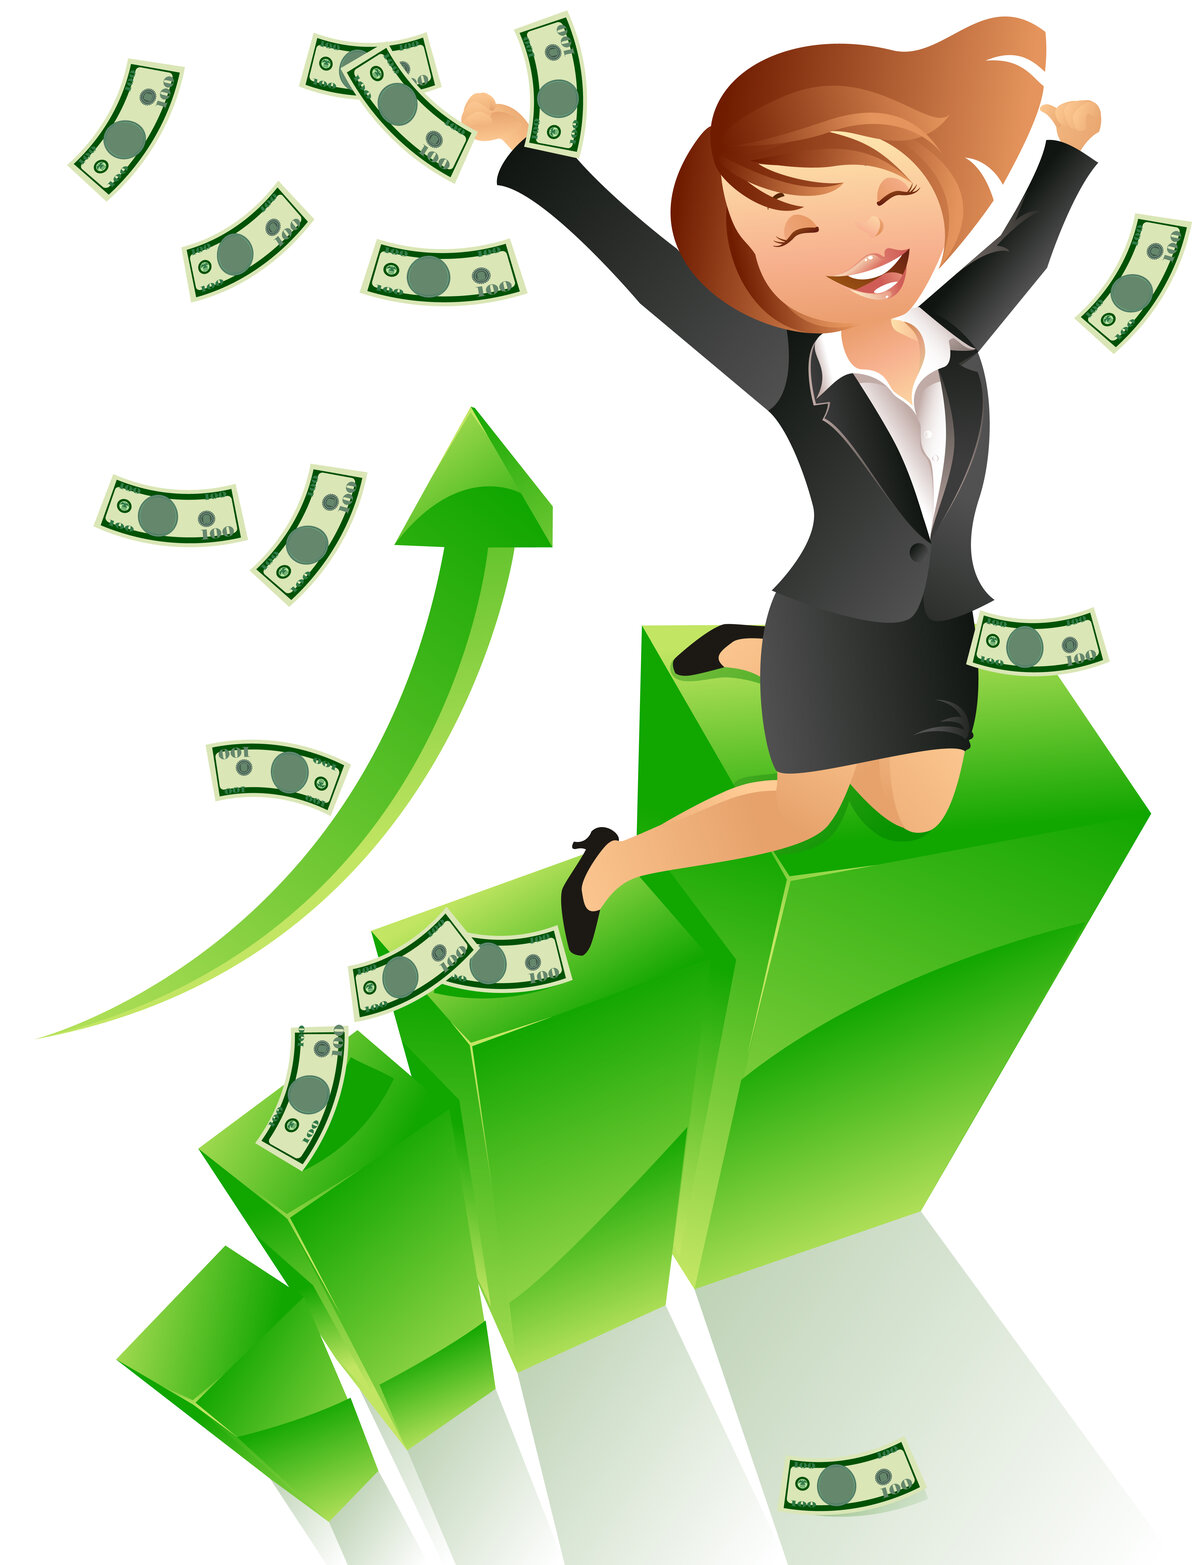 финансы успех картинки идти вперед